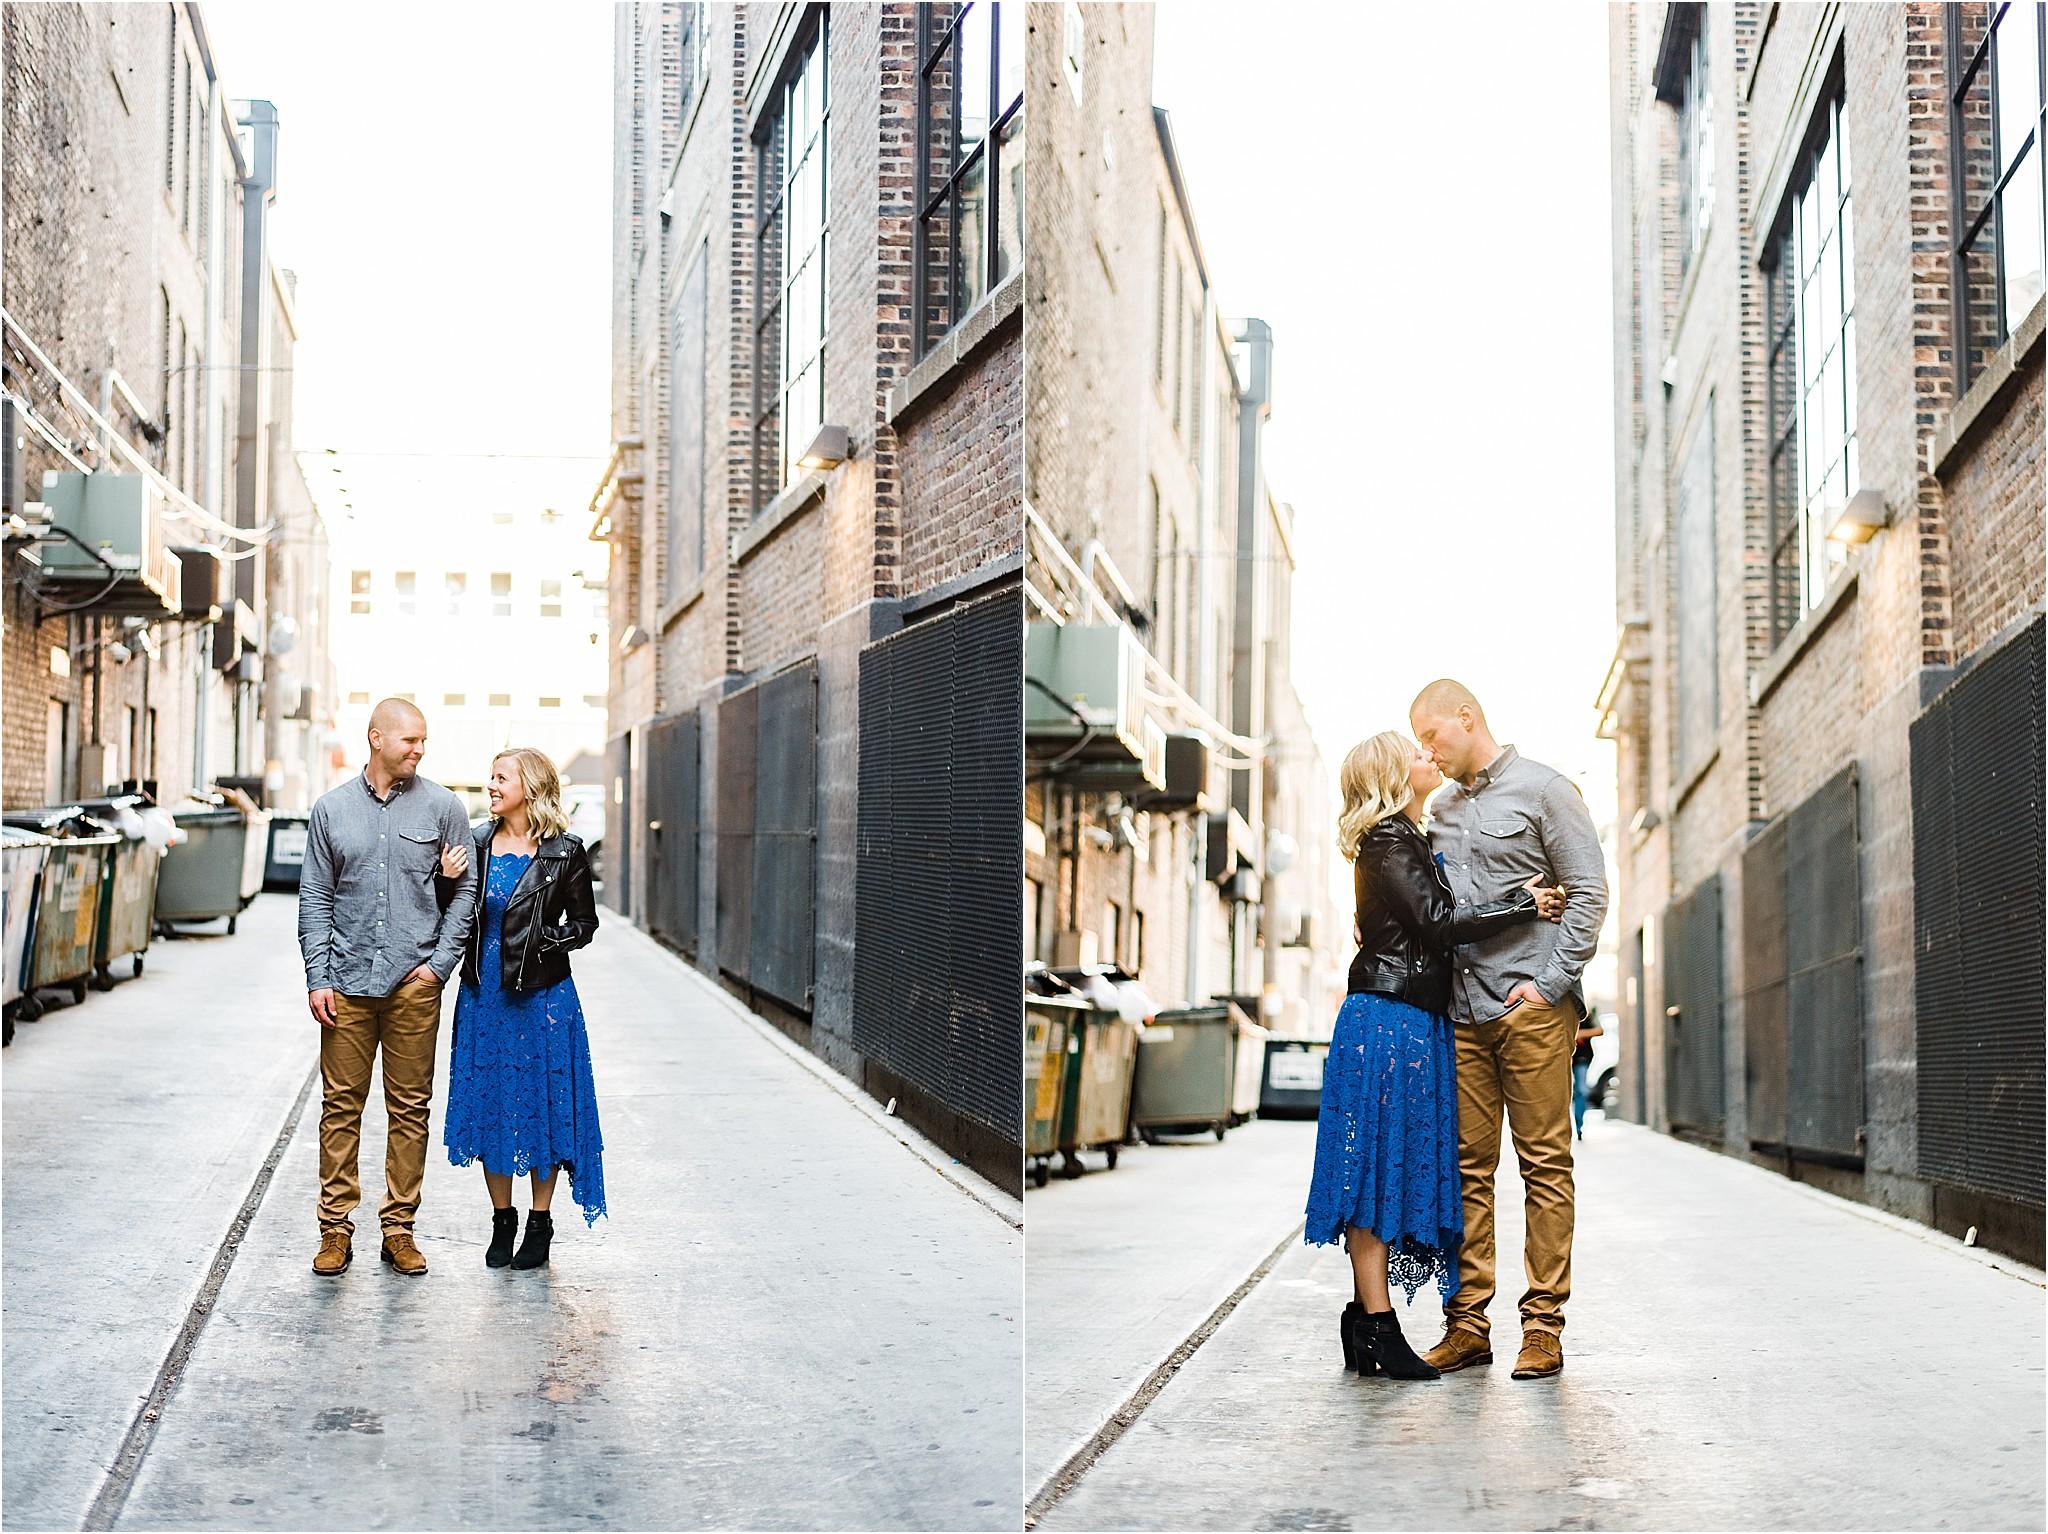 lish-marie-photography-wedding-photographer-chicago-west-loop_0013.jpg